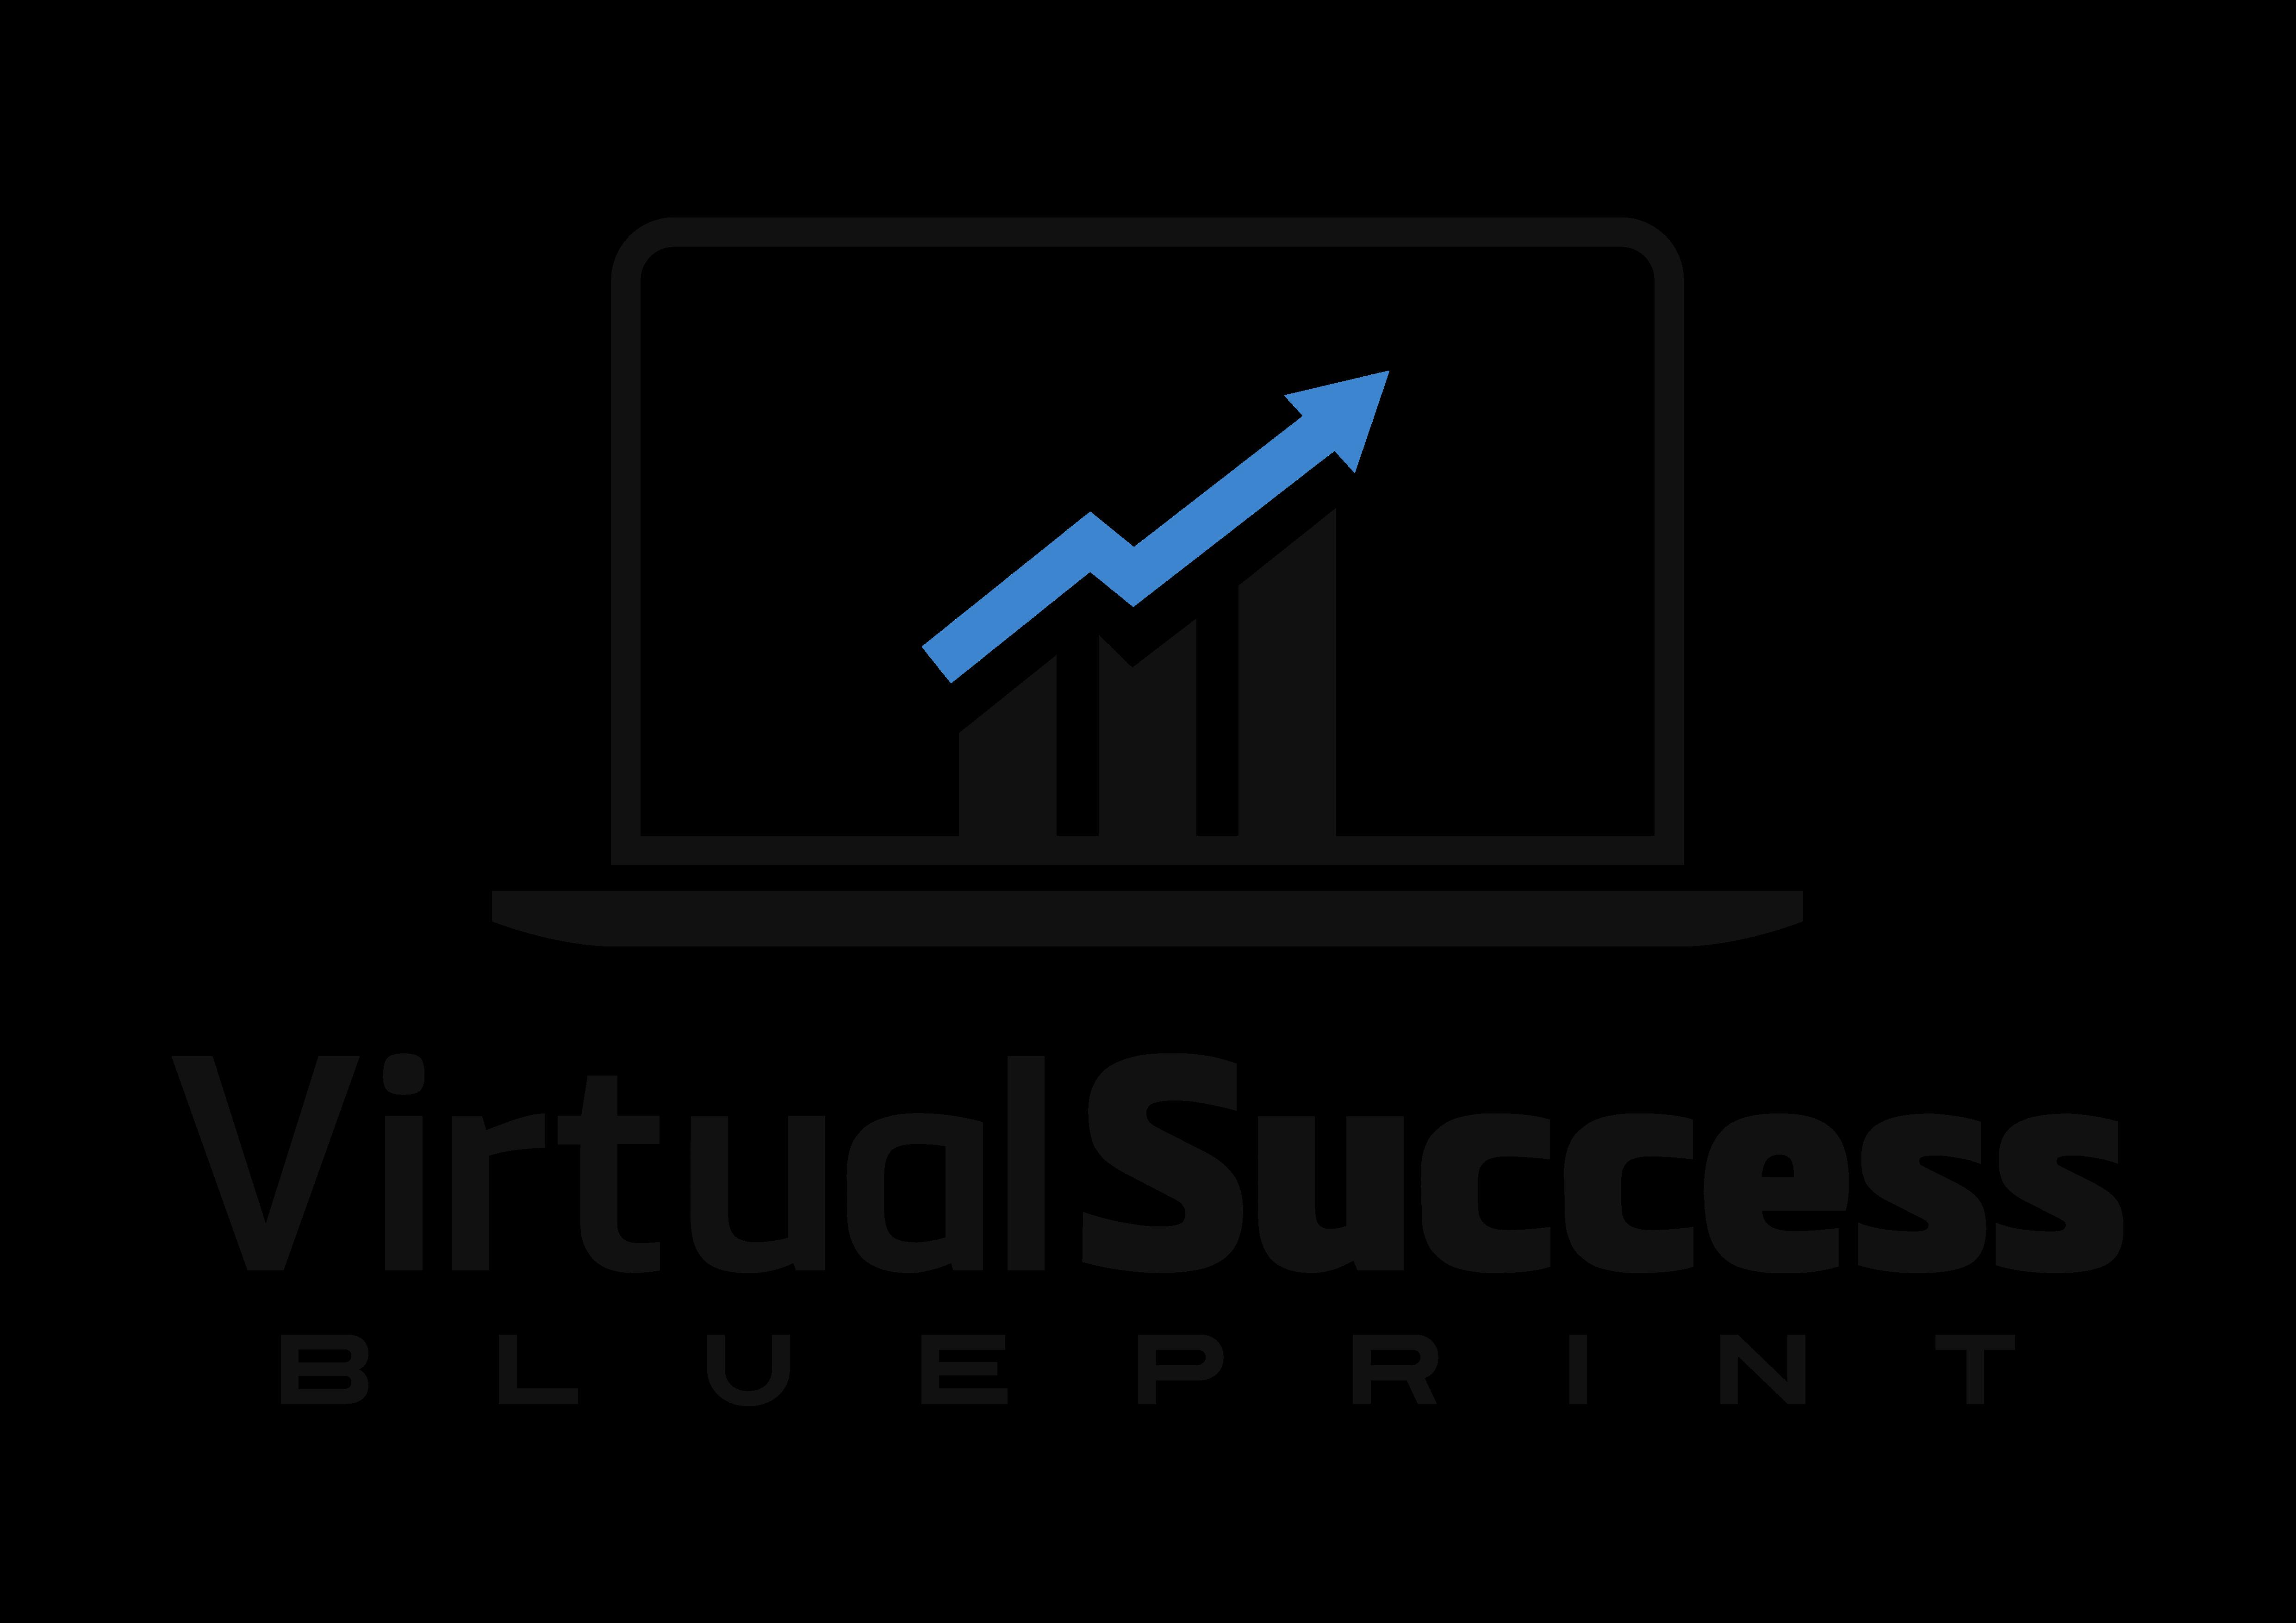 Virtual success blueprint online growth hub malvernweather Image collections